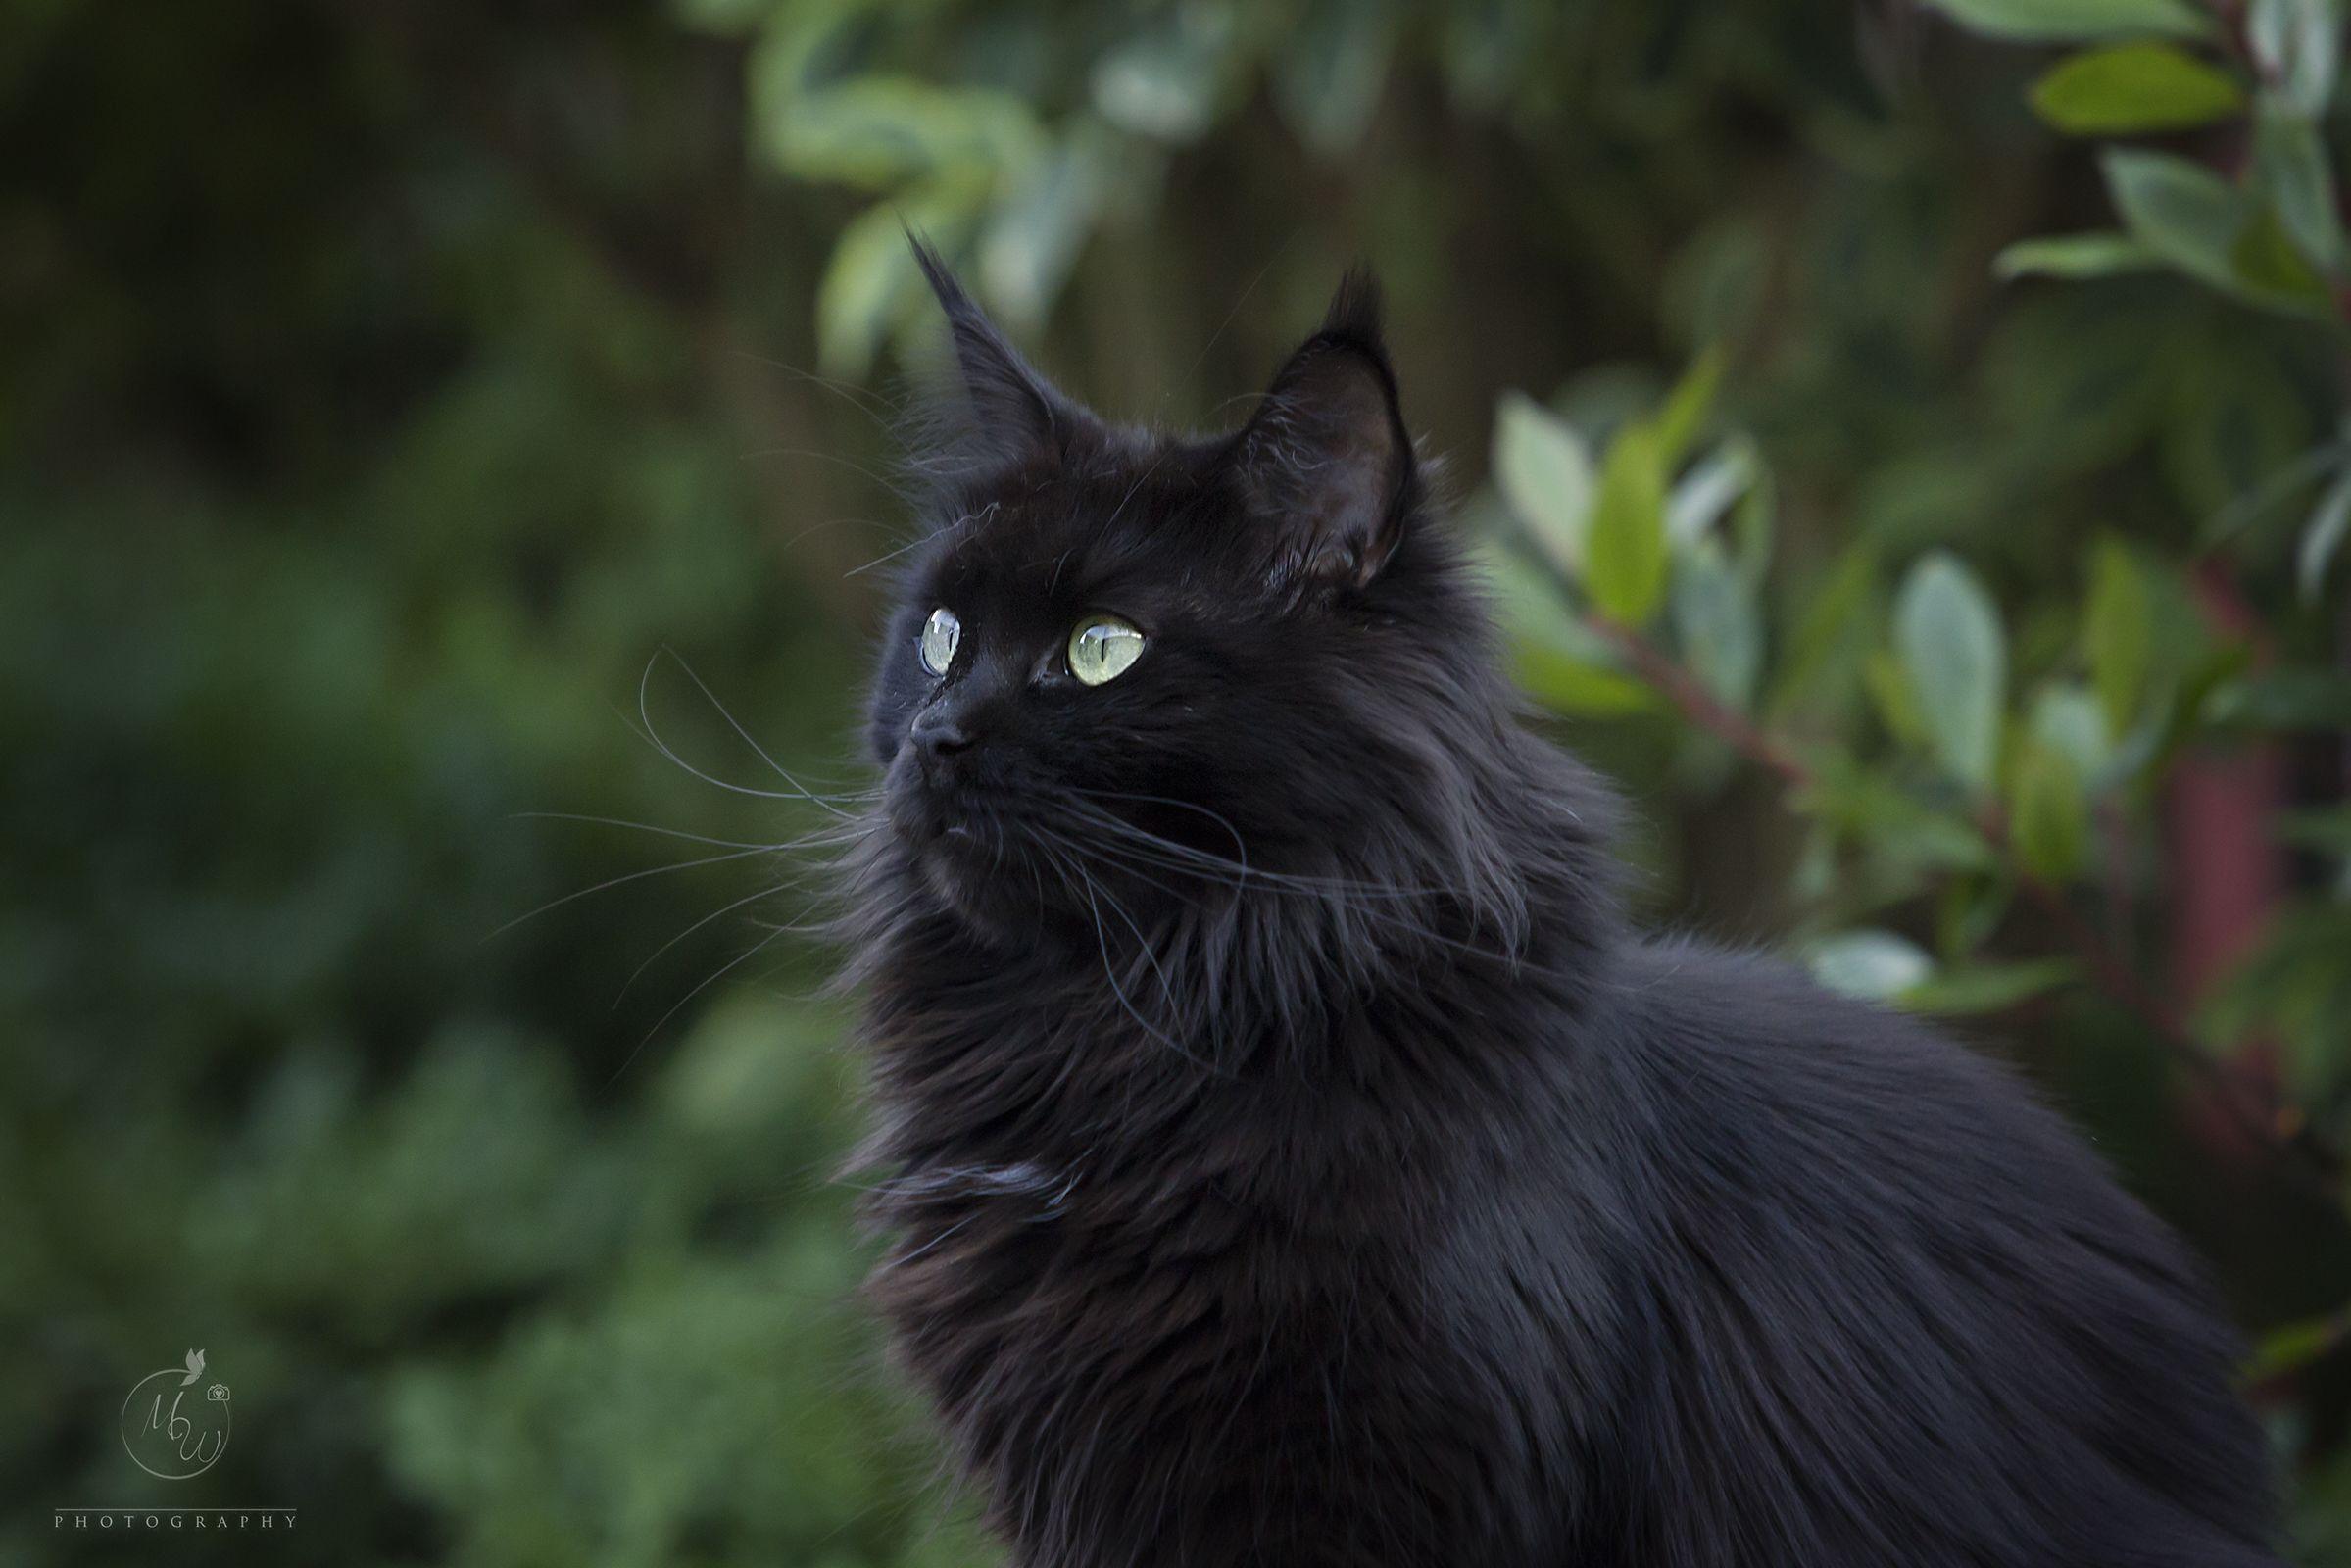 Pin By Darknessfantasy On My Cats Cat Anatomy Warrior Cats Cute Animals